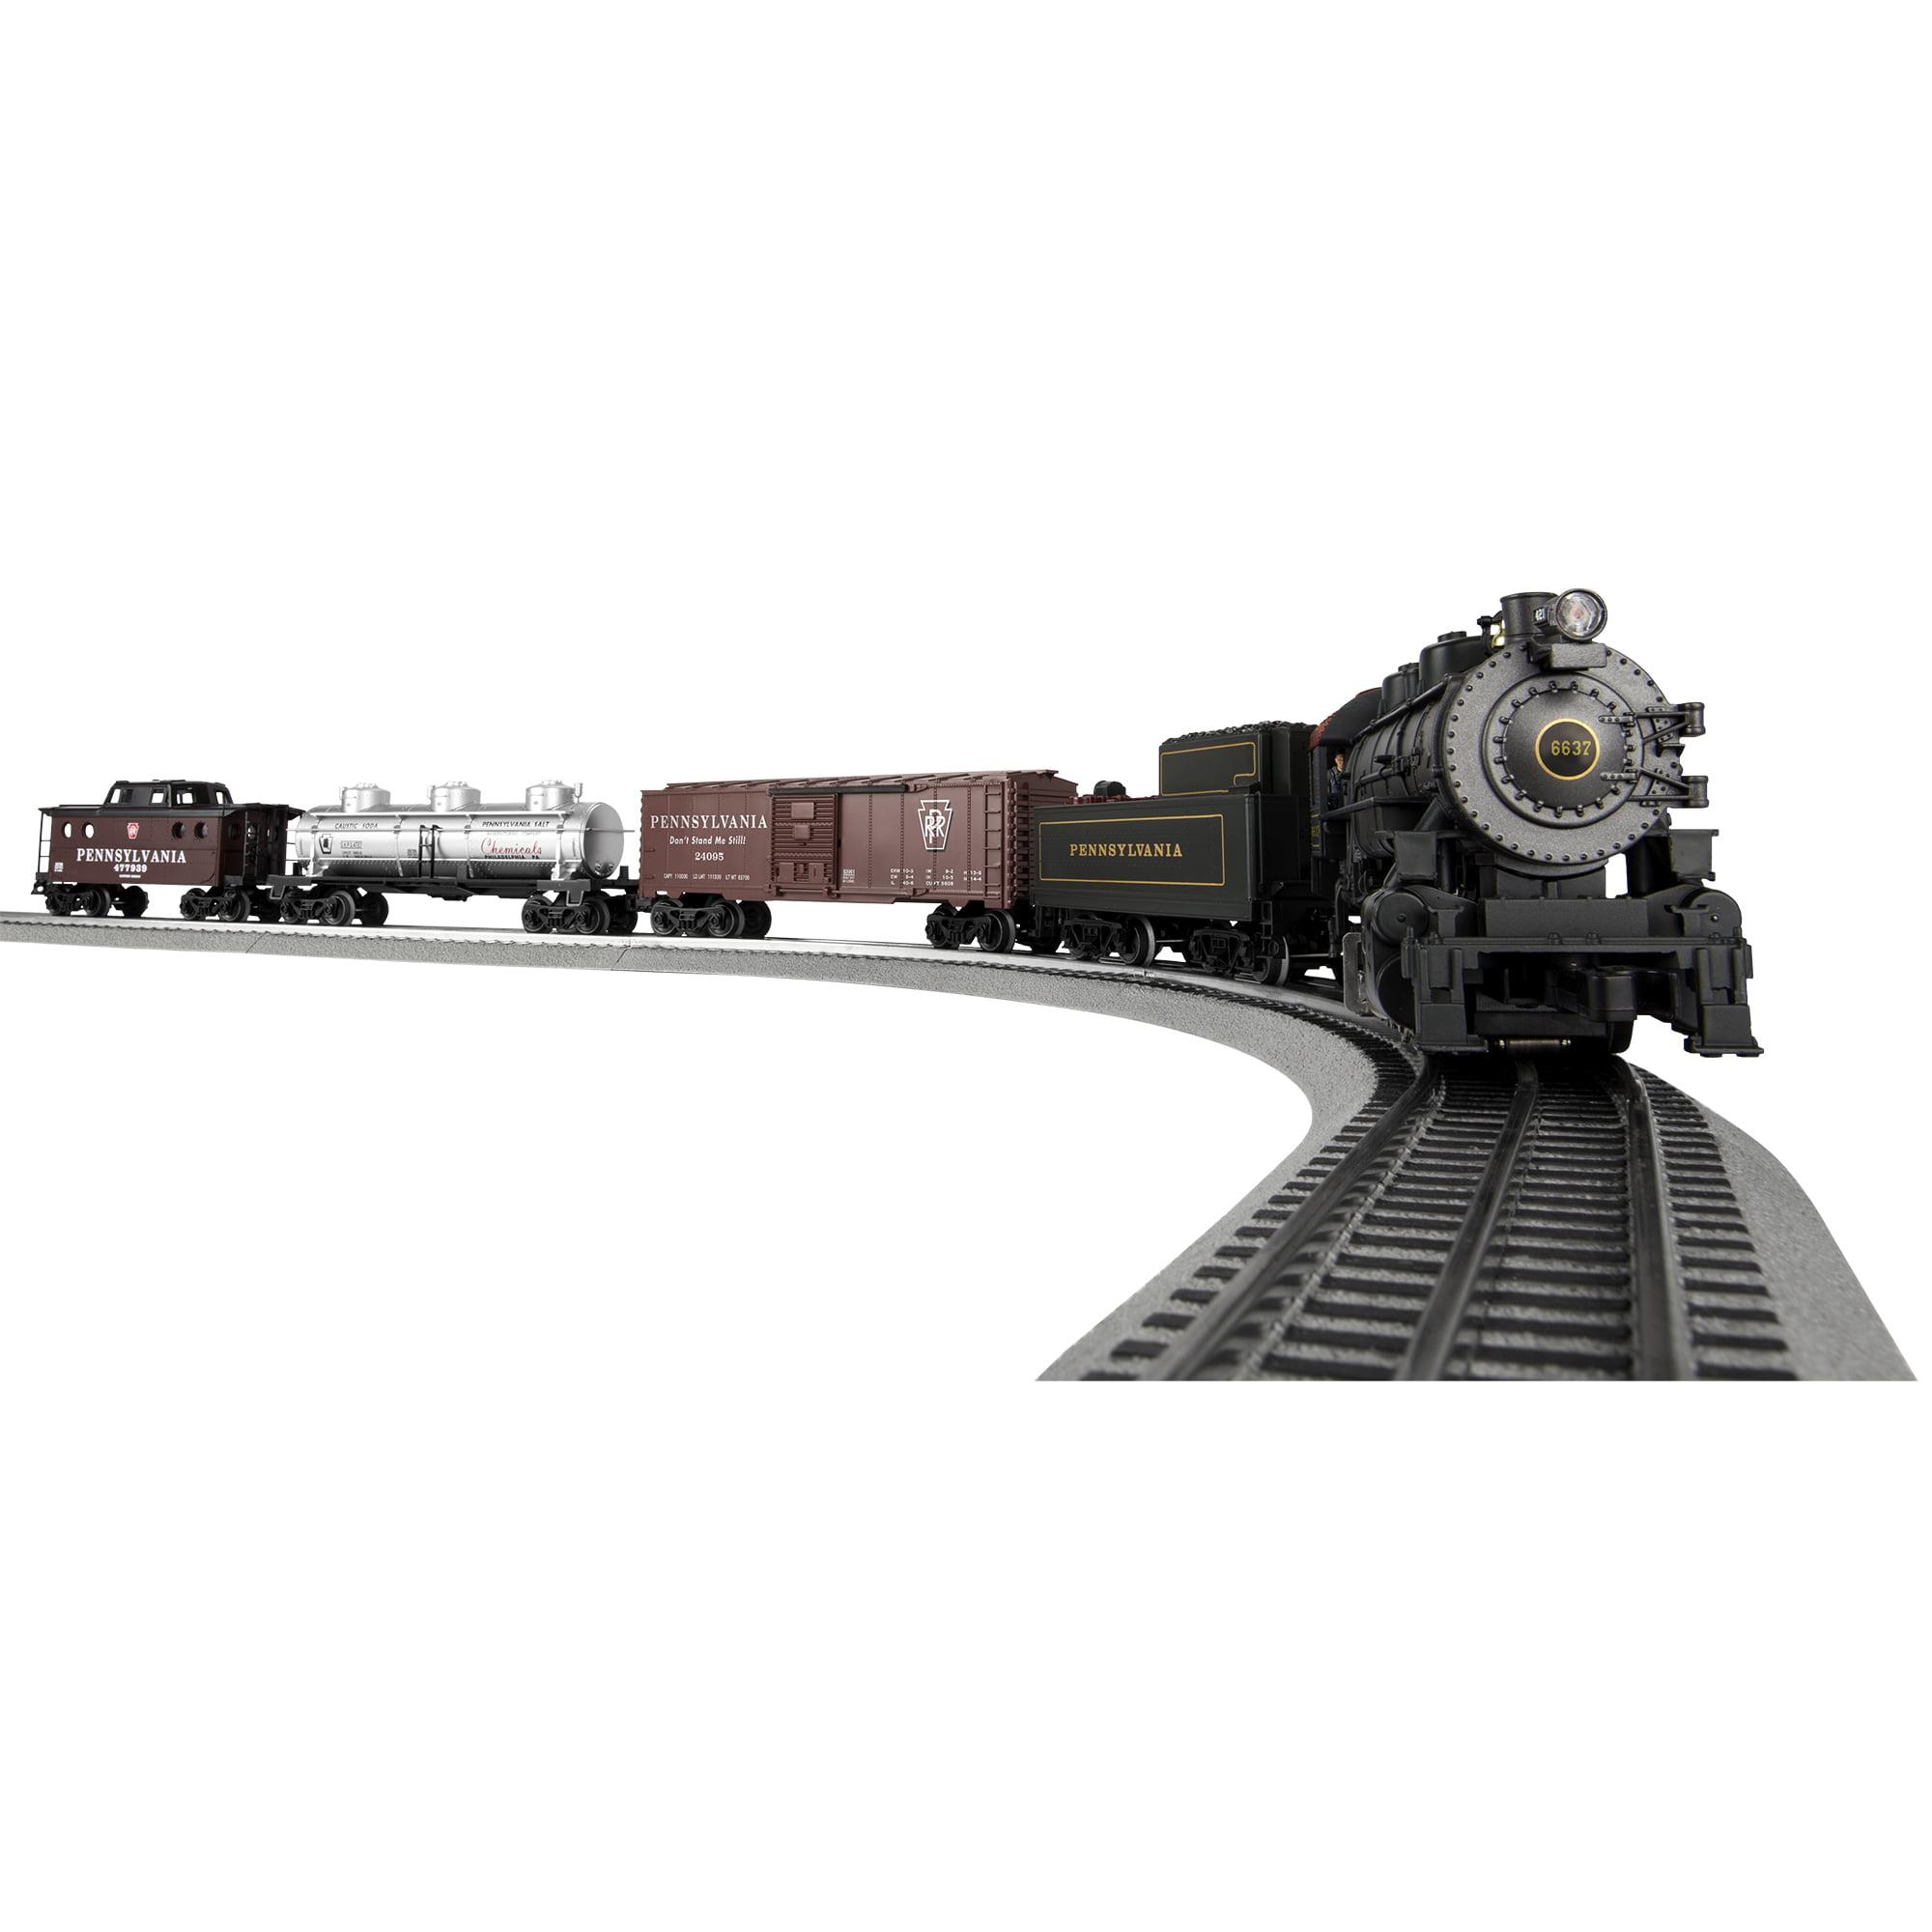 Lionel Trains PennSylvania Flyer Seasonal Freight LionChief Ready to Run Set w BlueTooth by Lionel Trains